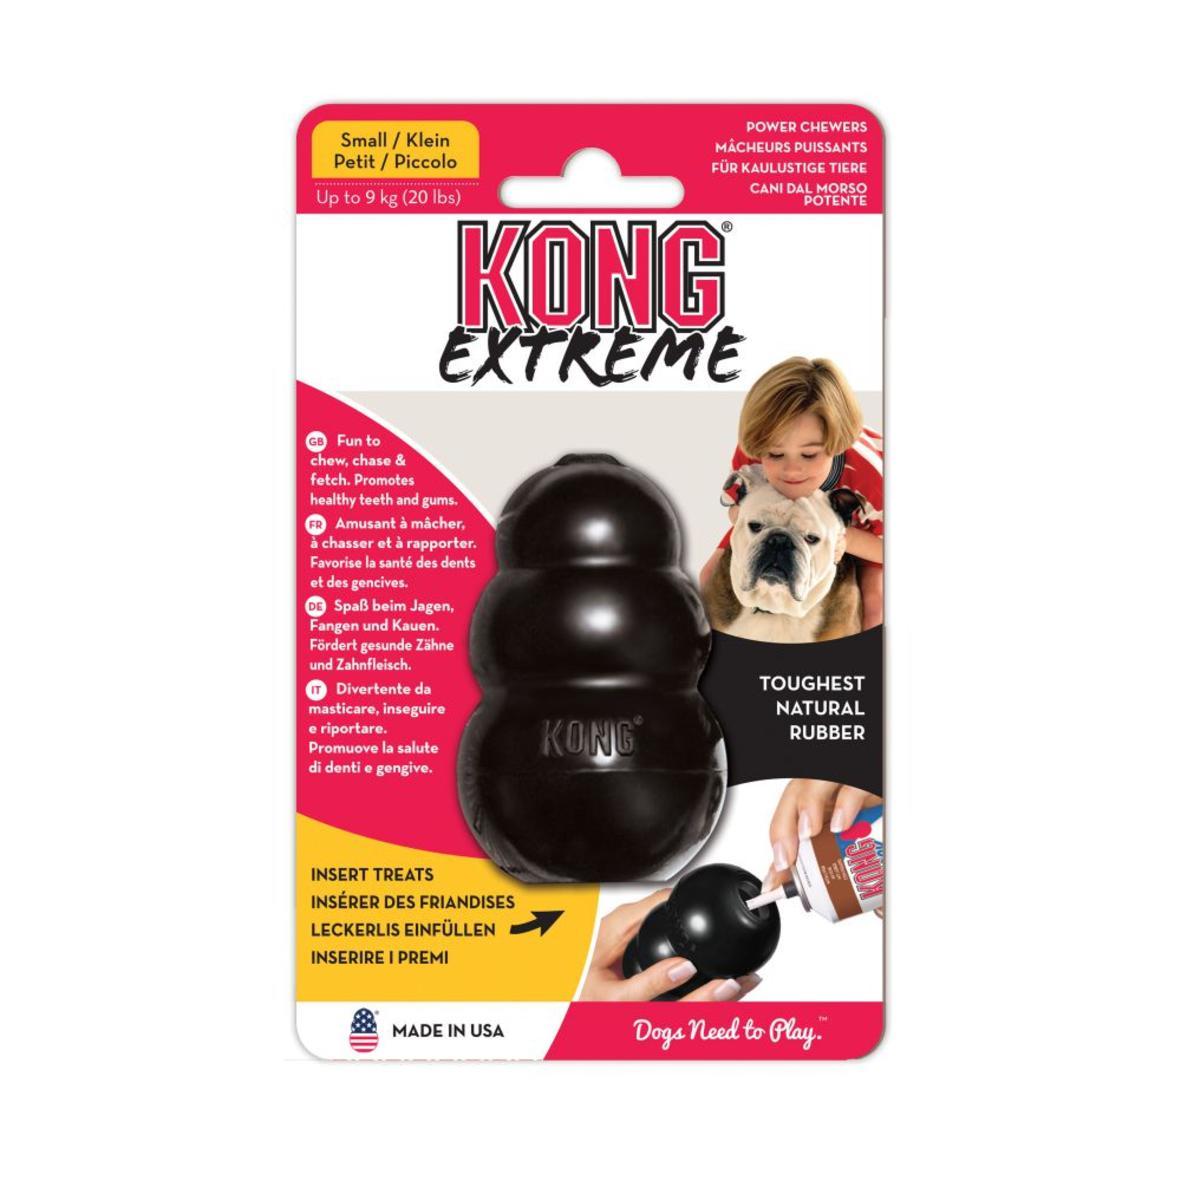 KONG Extreme Original Black